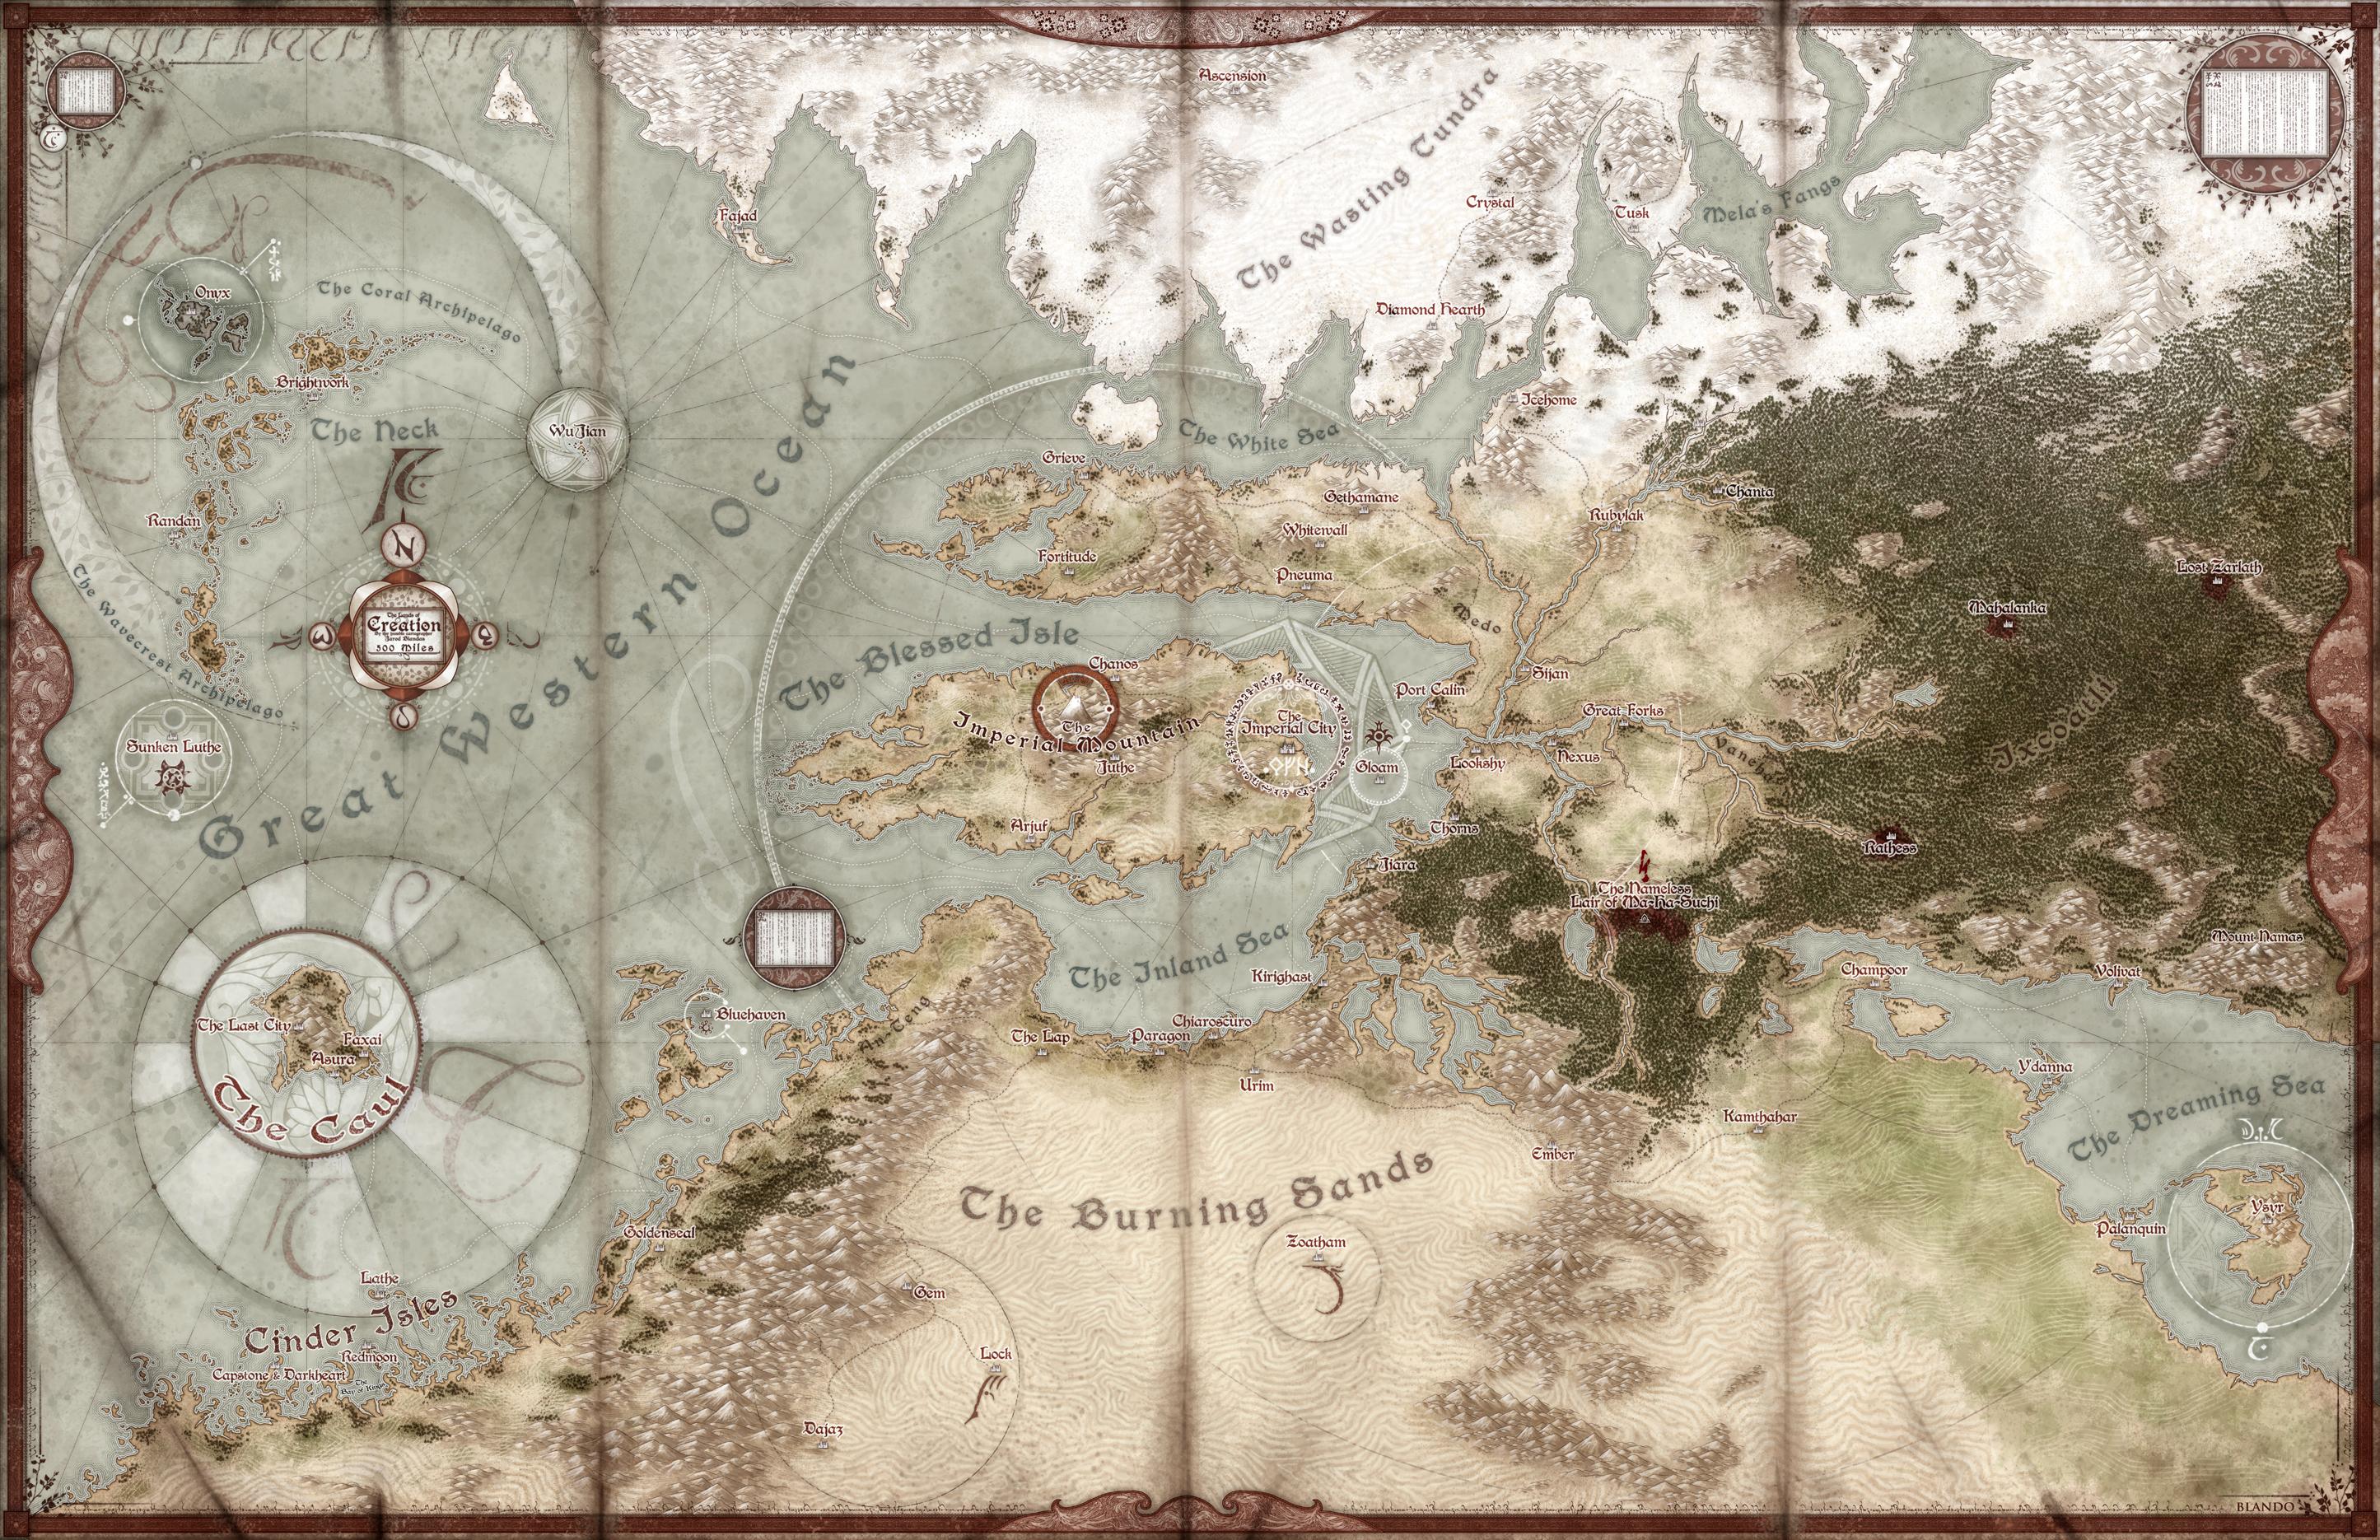 Exalted_World_Map_1_85dpi.jpg